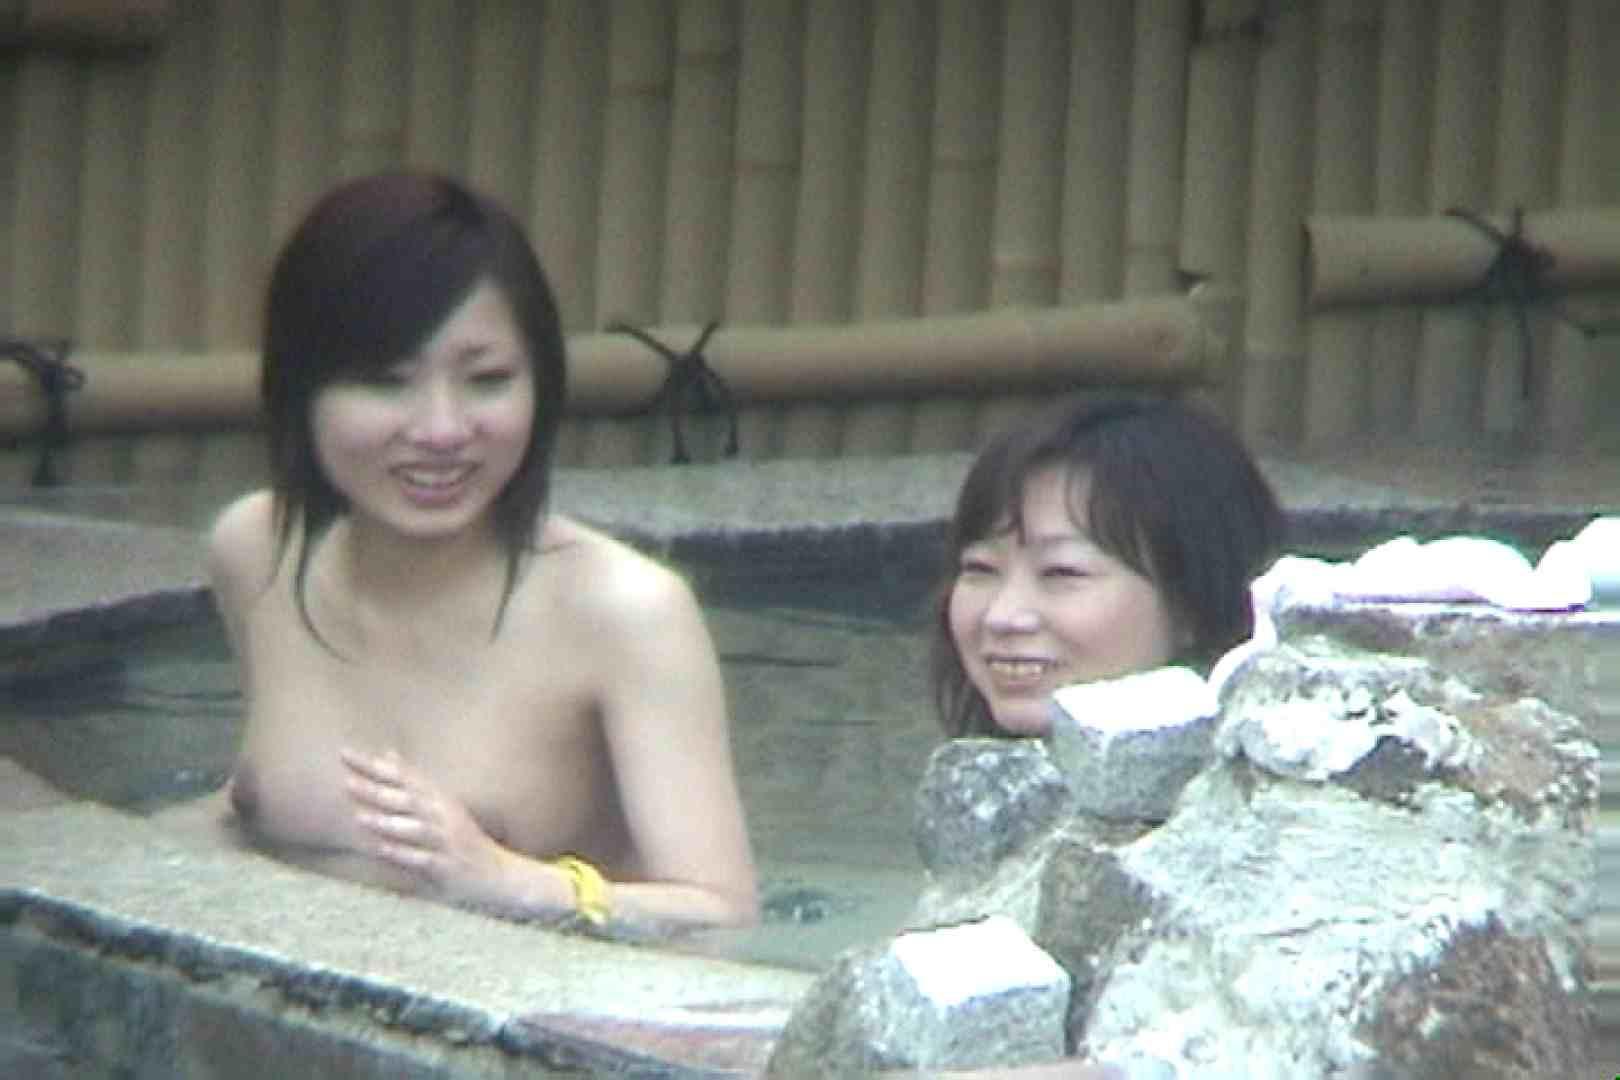 Aquaな露天風呂Vol.58【VIP限定】 0 | 0  71連発 31